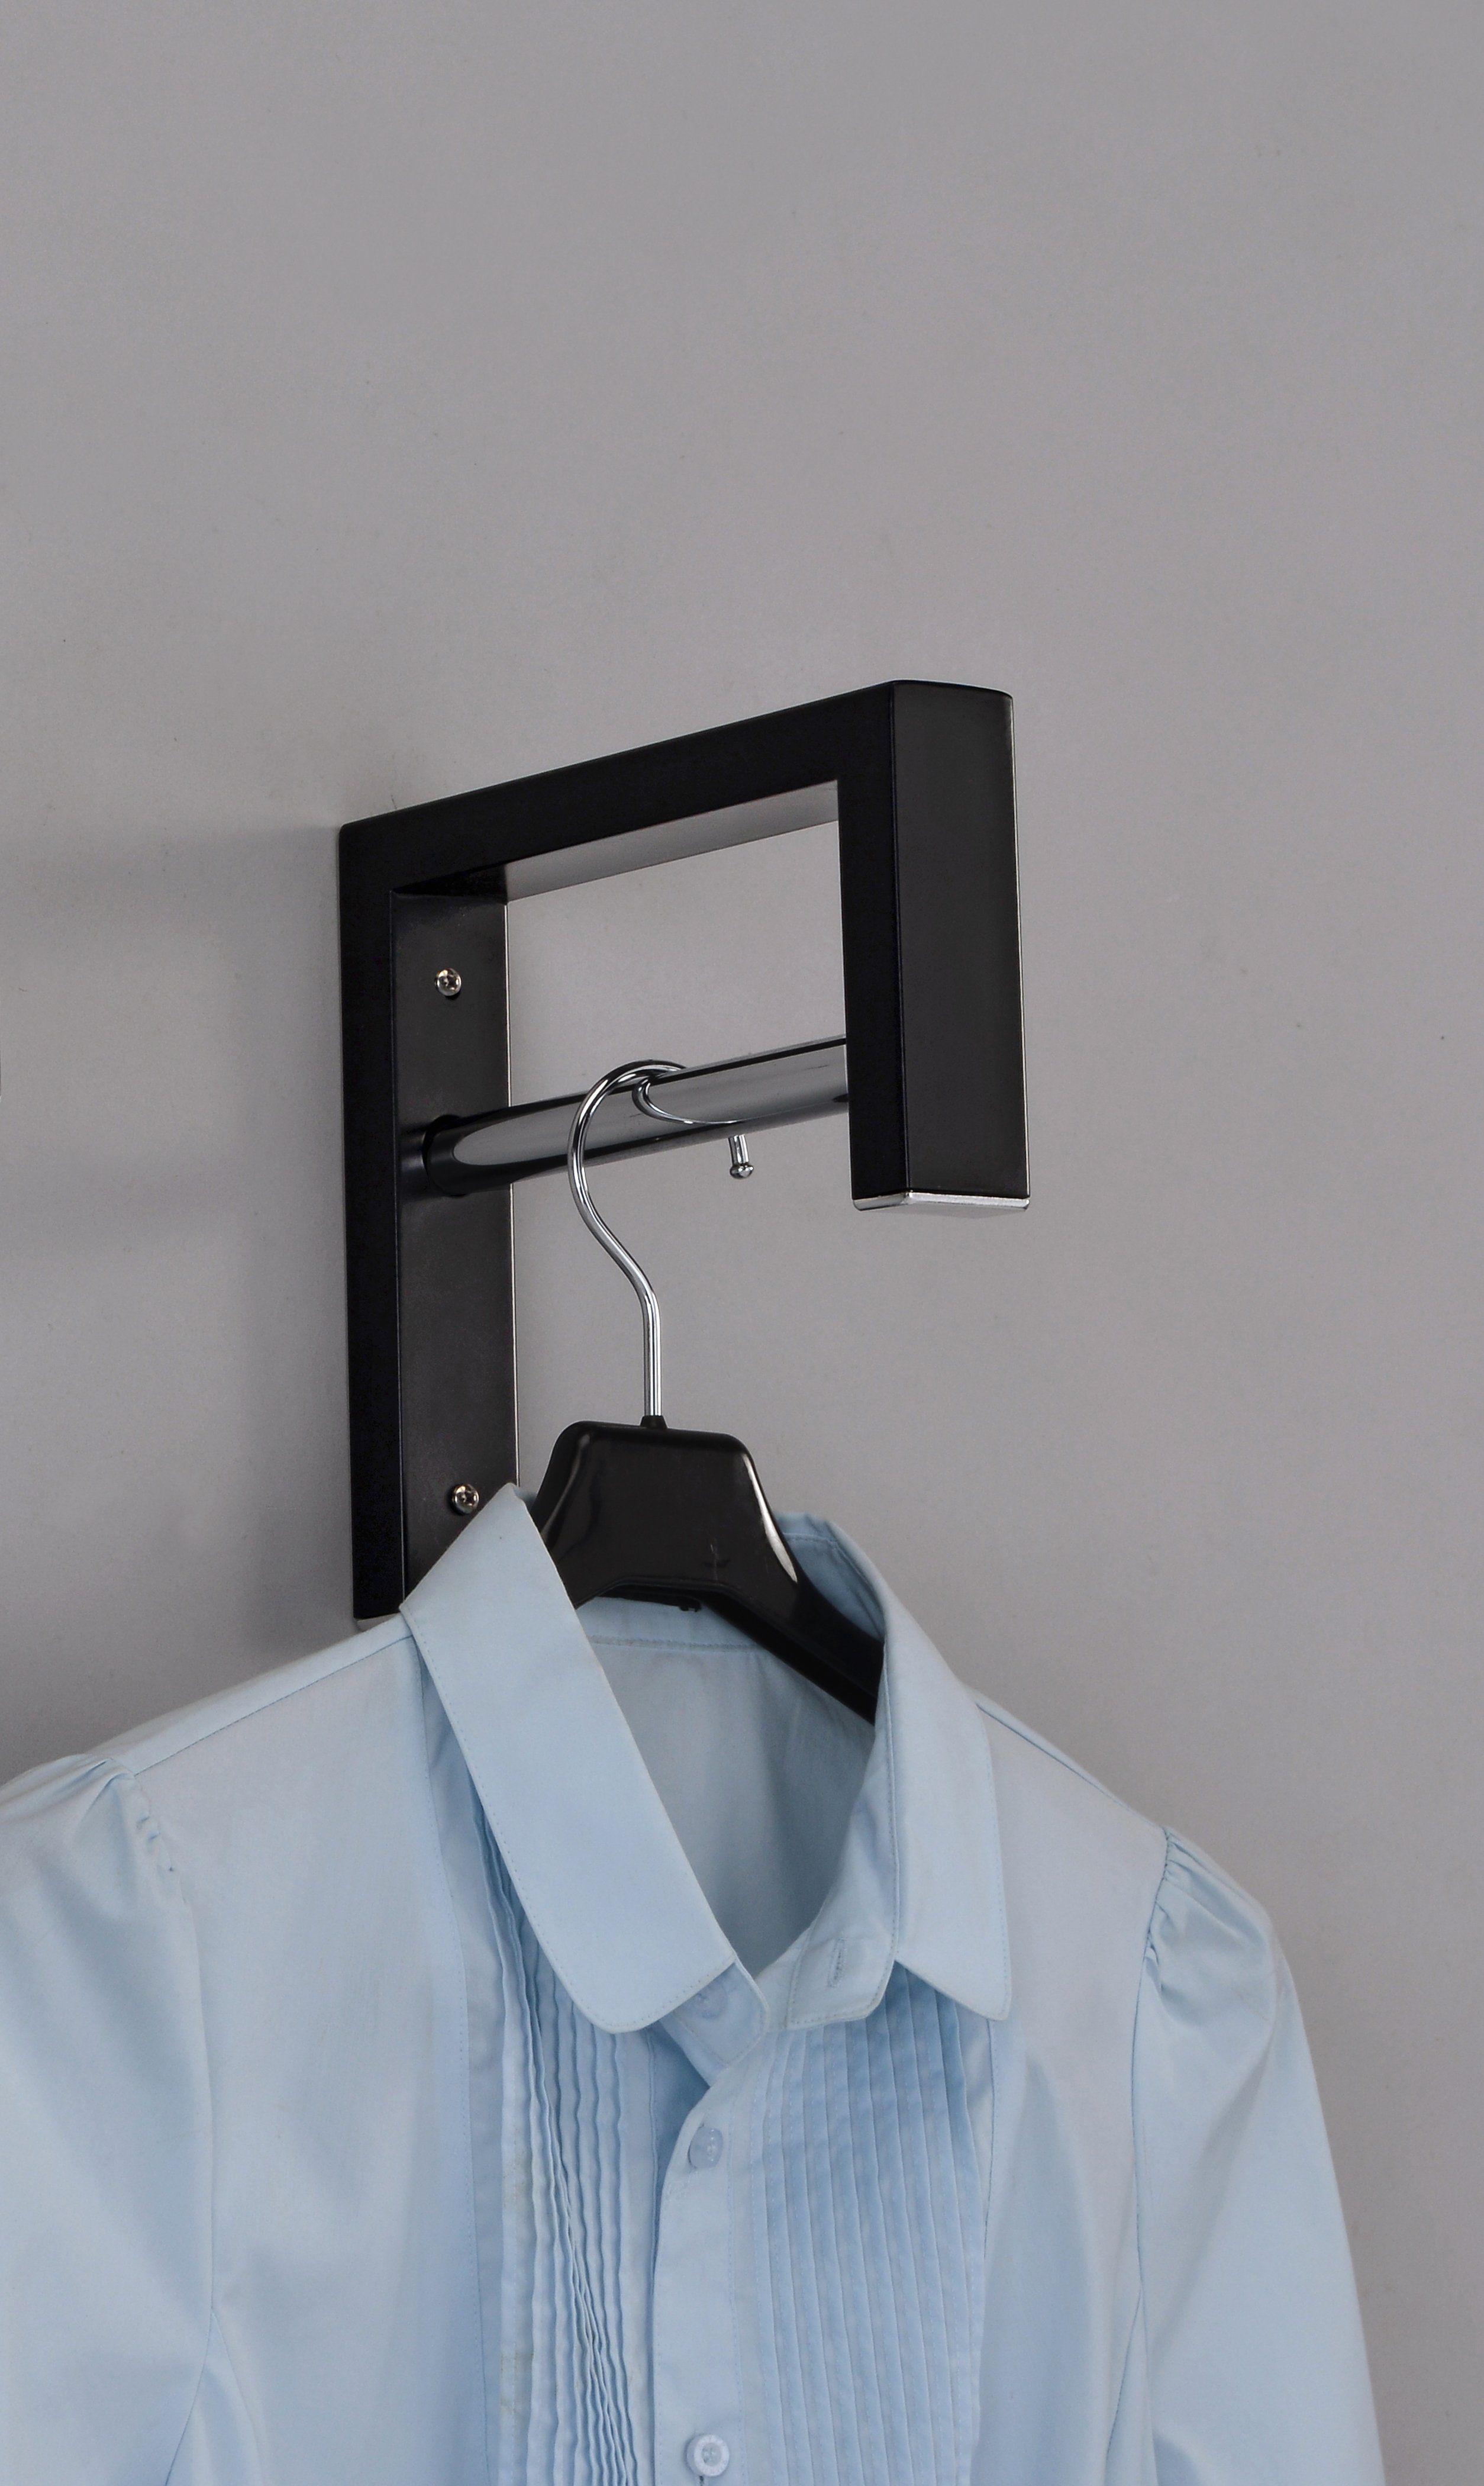 Albin Wall Mounted Cloth Rack Black Metal In 2020 Clothing Rack Clothes Hooks Hanger Rack